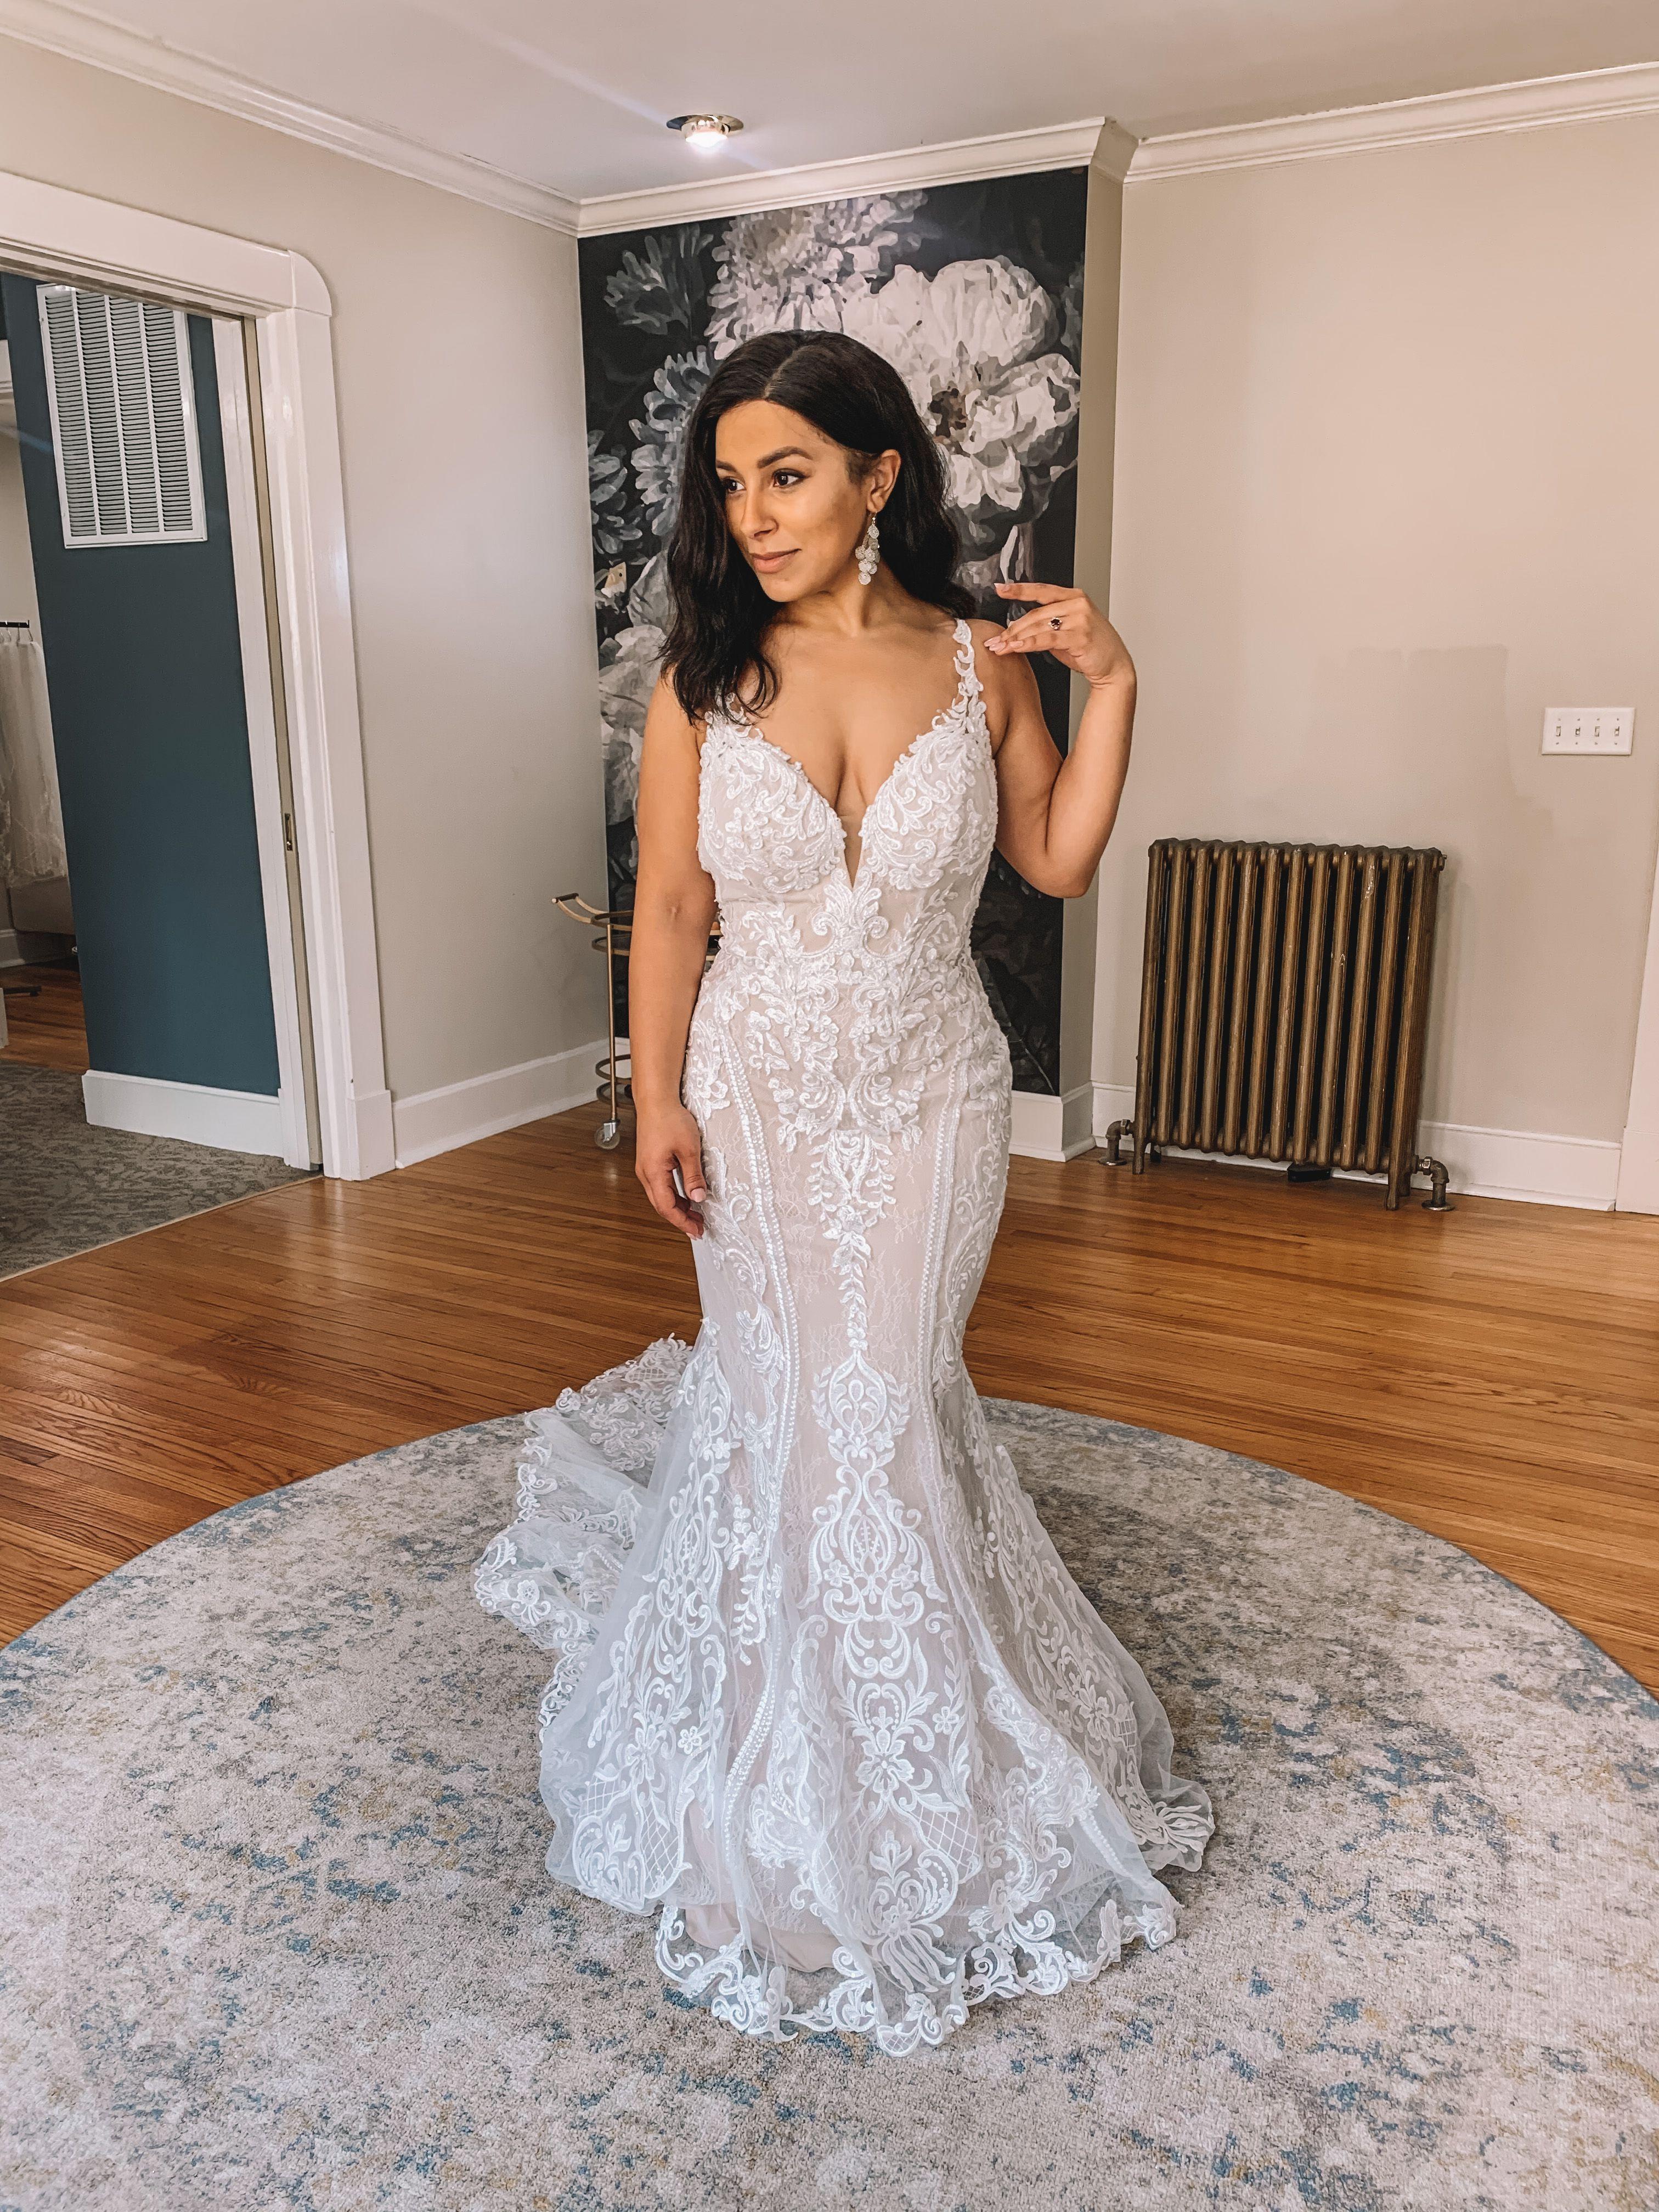 41++ Simple lace wedding dress australia information